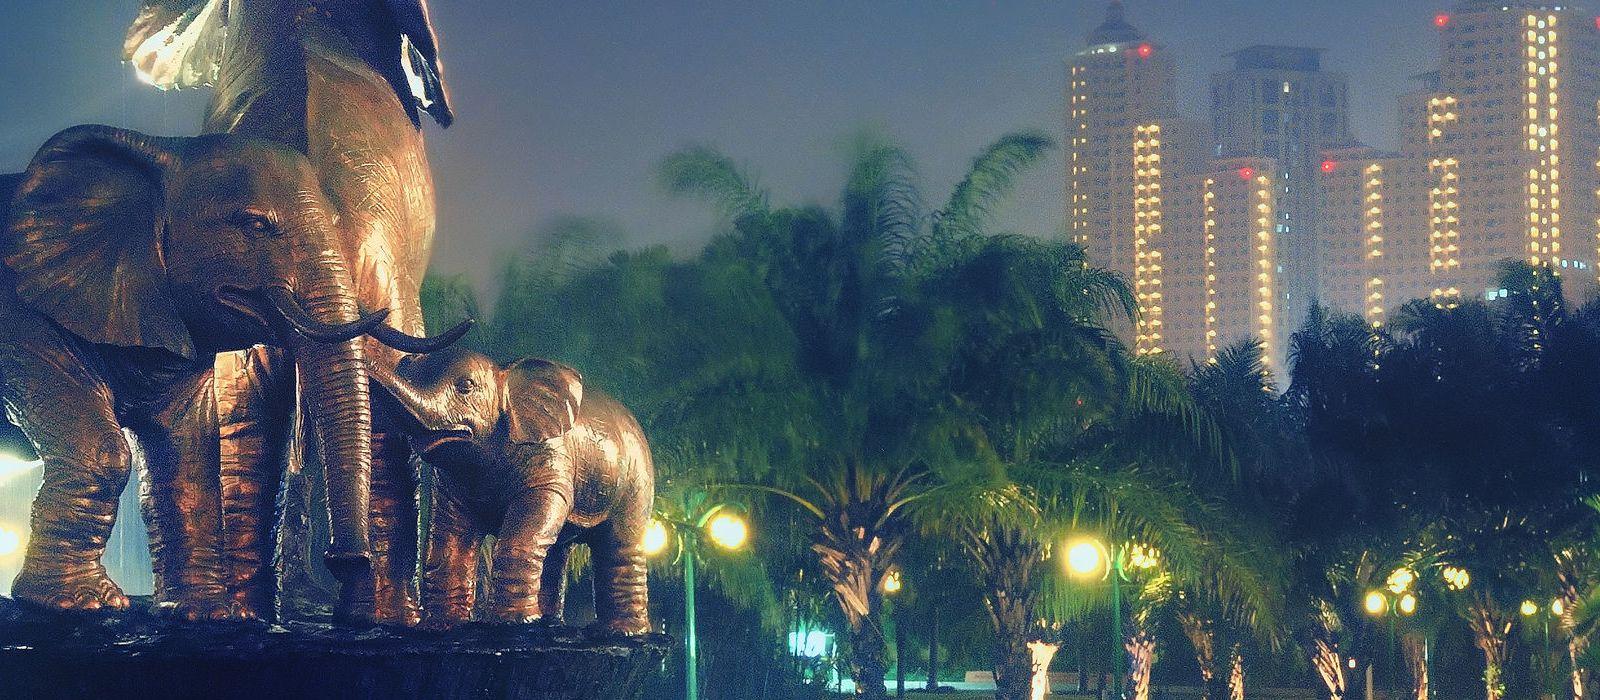 Destination Surabaya Indonesia